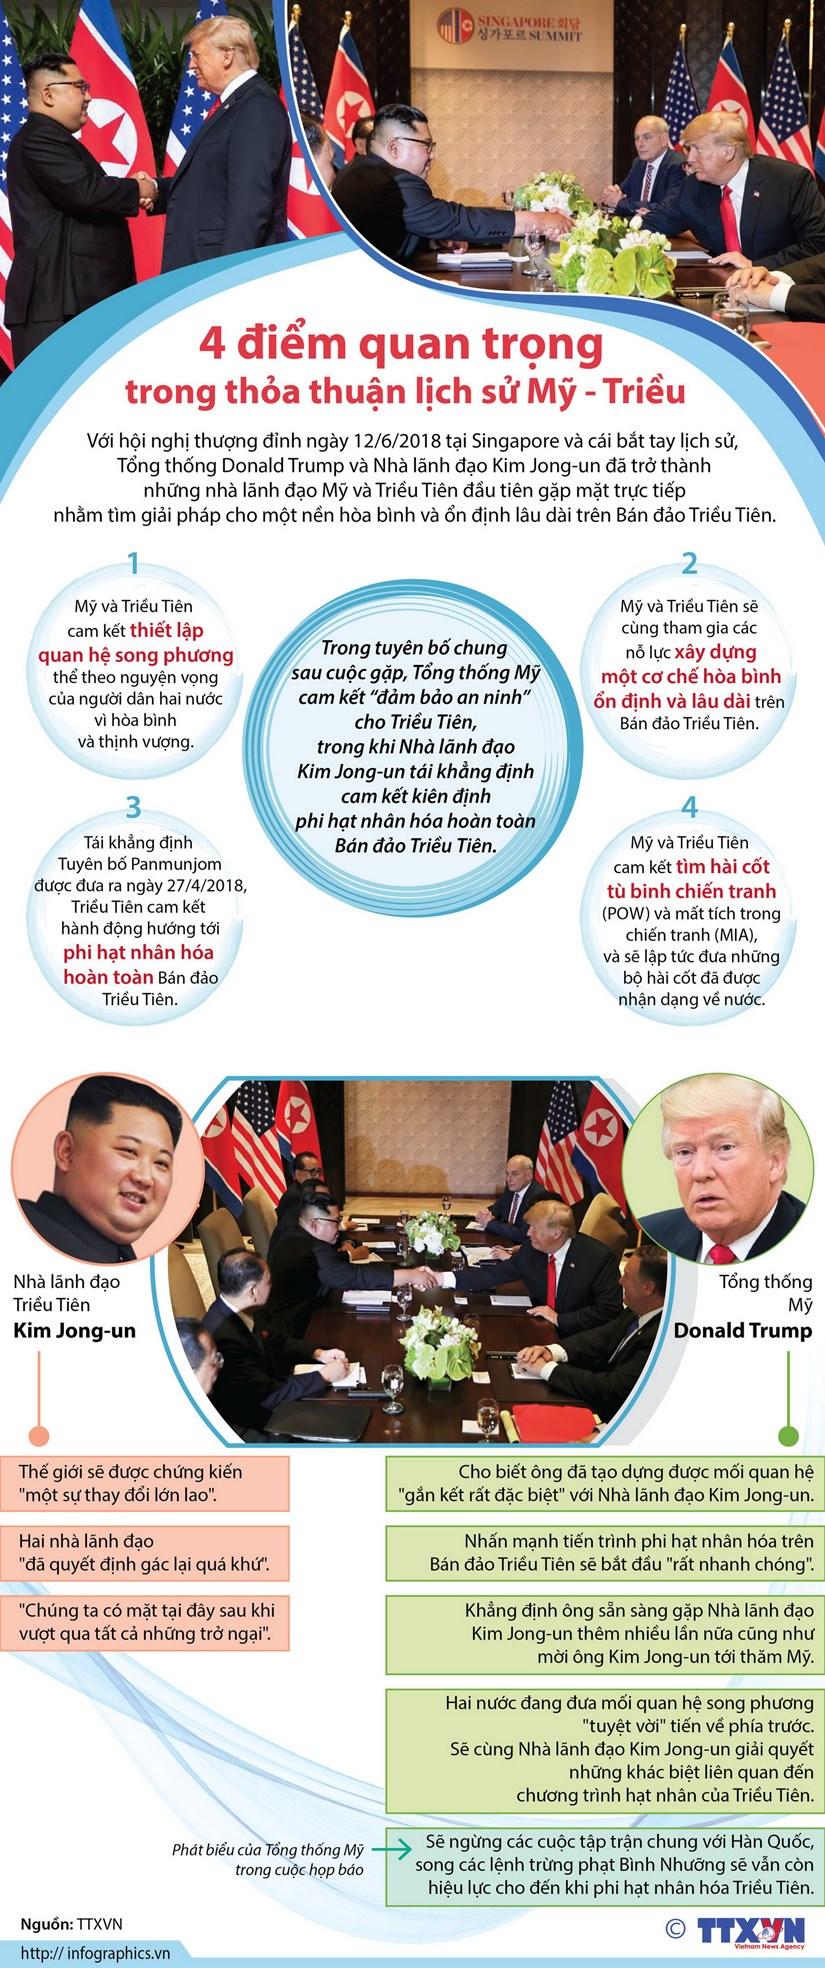 [Infographics] 4 diem quan trong trong thoa thuan lich su My-Trieu hinh anh 1